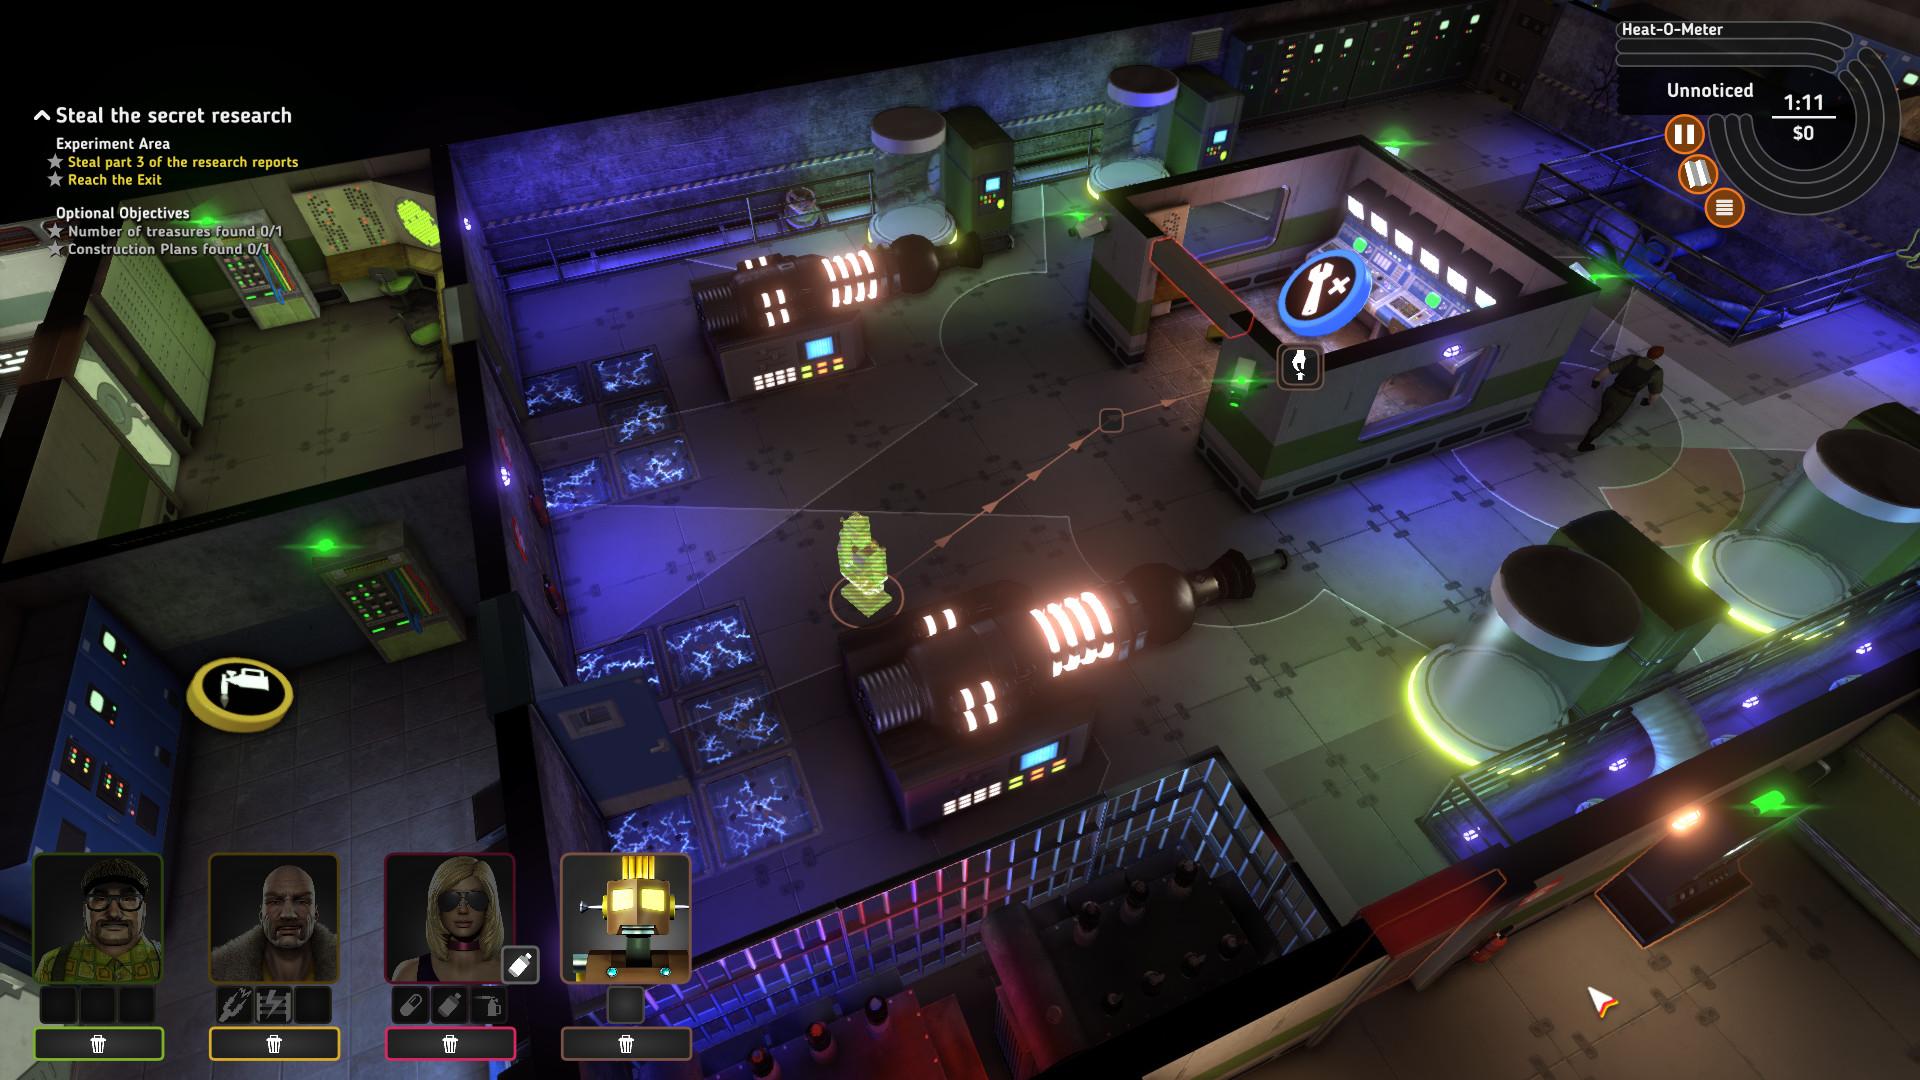 Crookz - The Big Heist screenshot